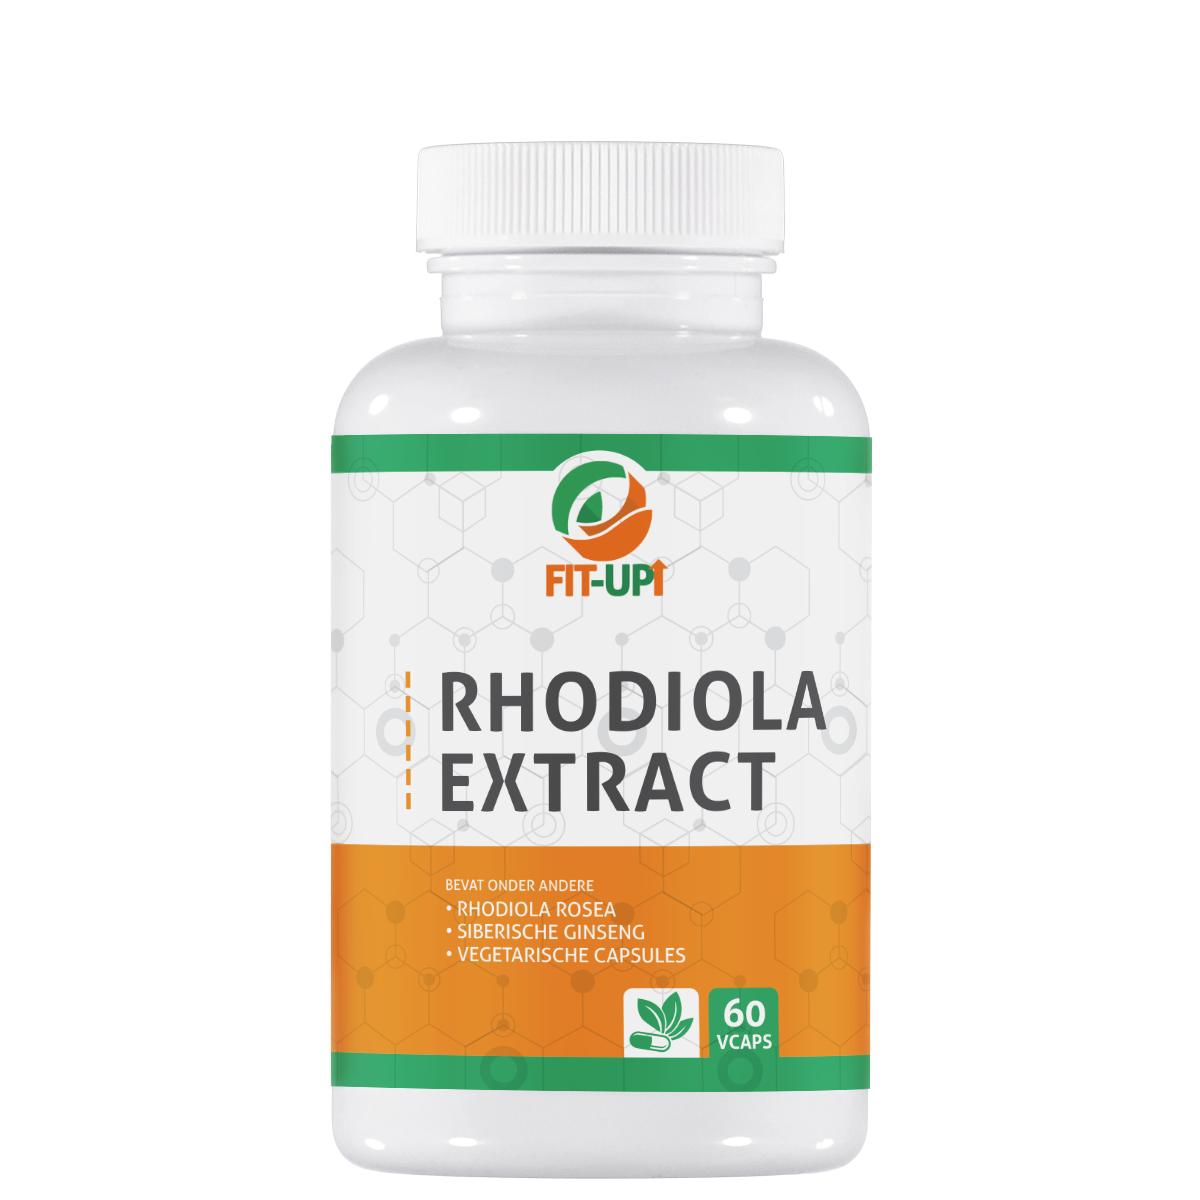 Rhodiola extract - 60 capsules